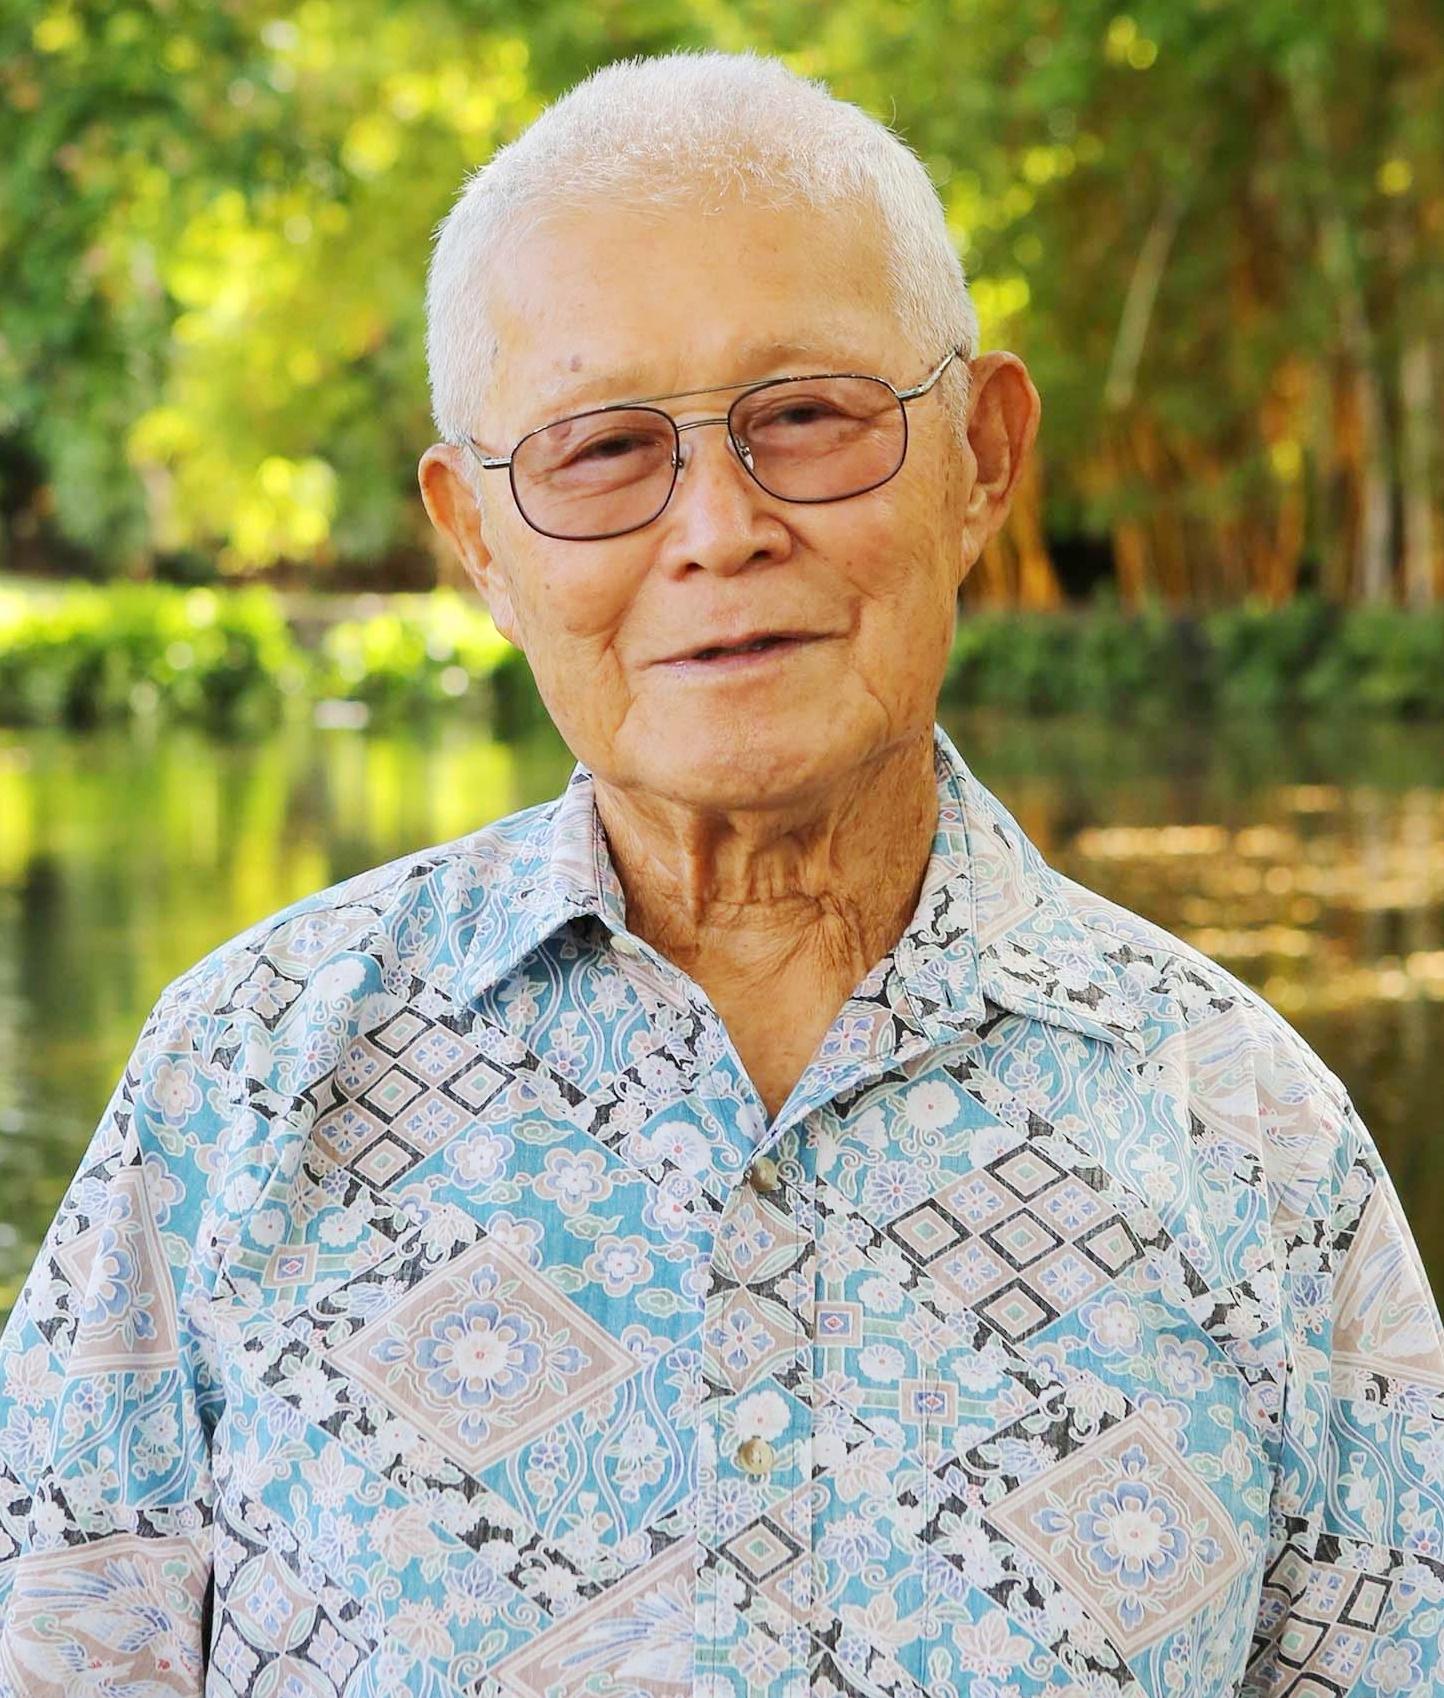 Walter Kenji Yamada